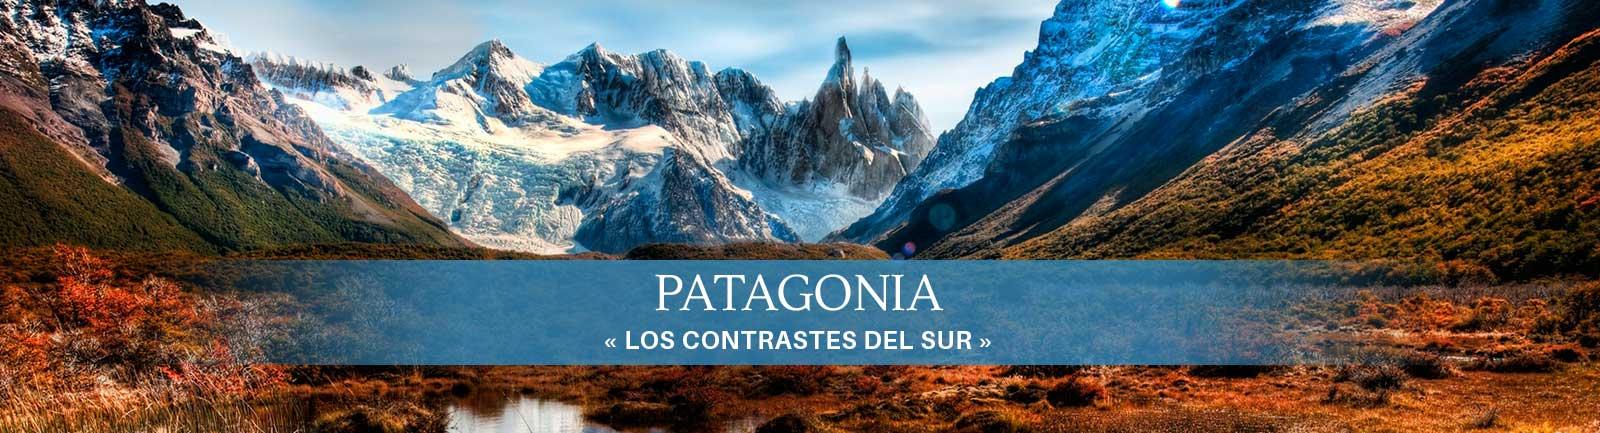 Crucero Patagonia